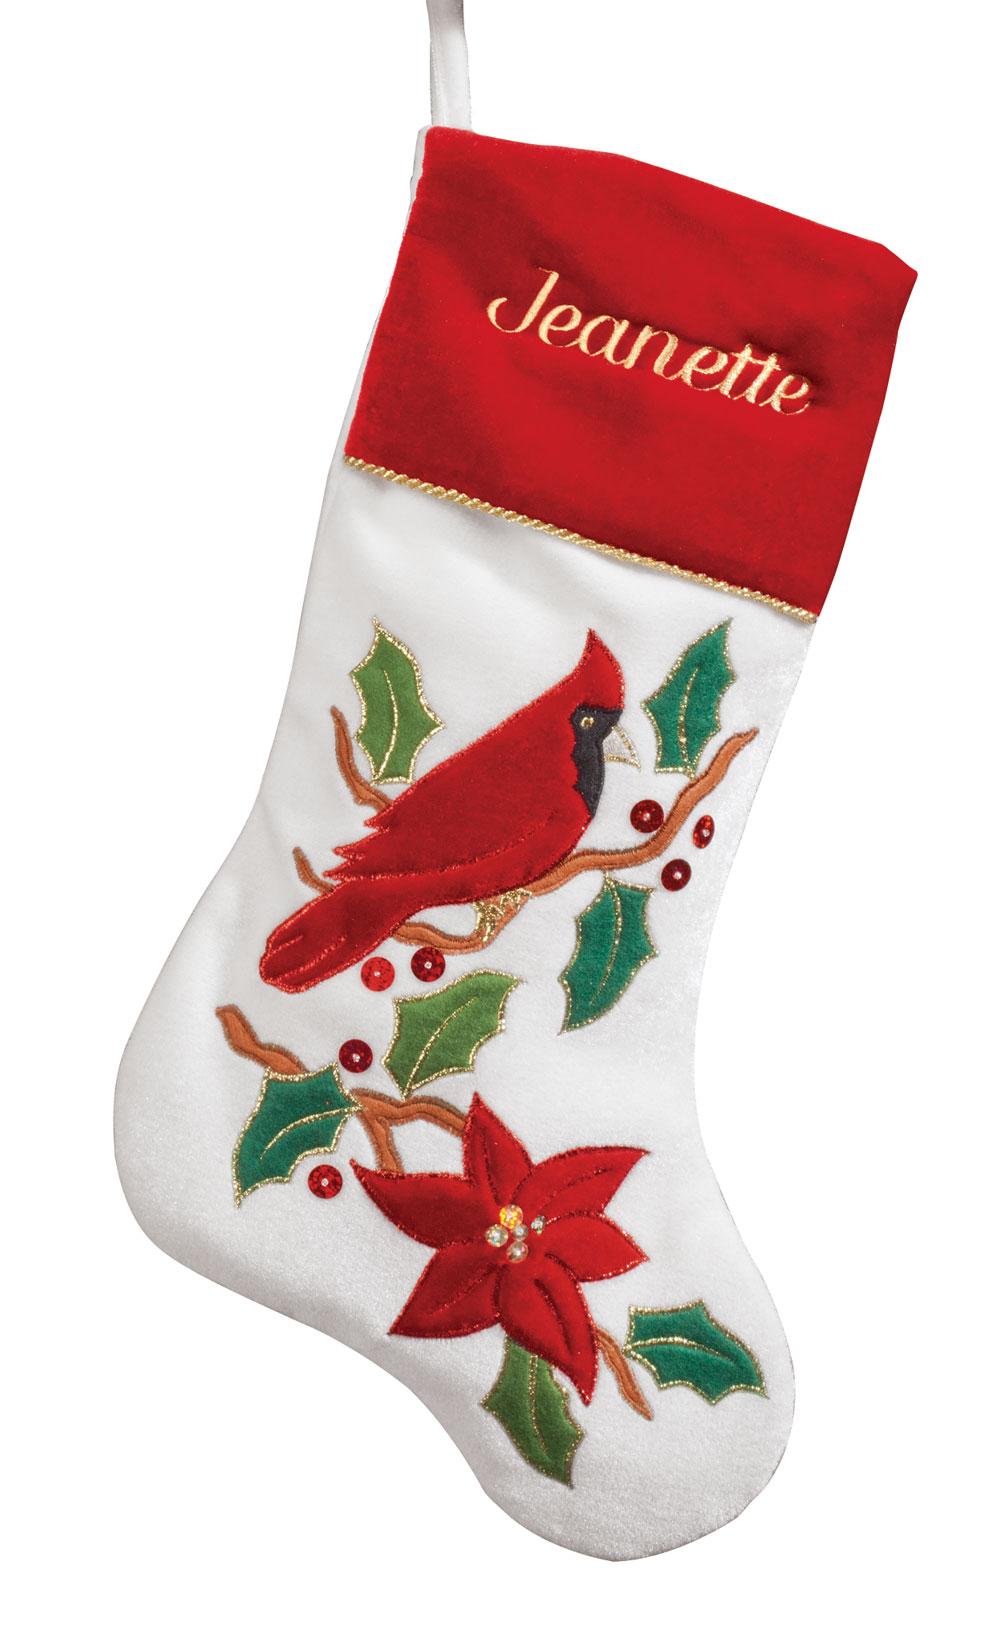 Personalized Christmas Stocking Personalized Stocking